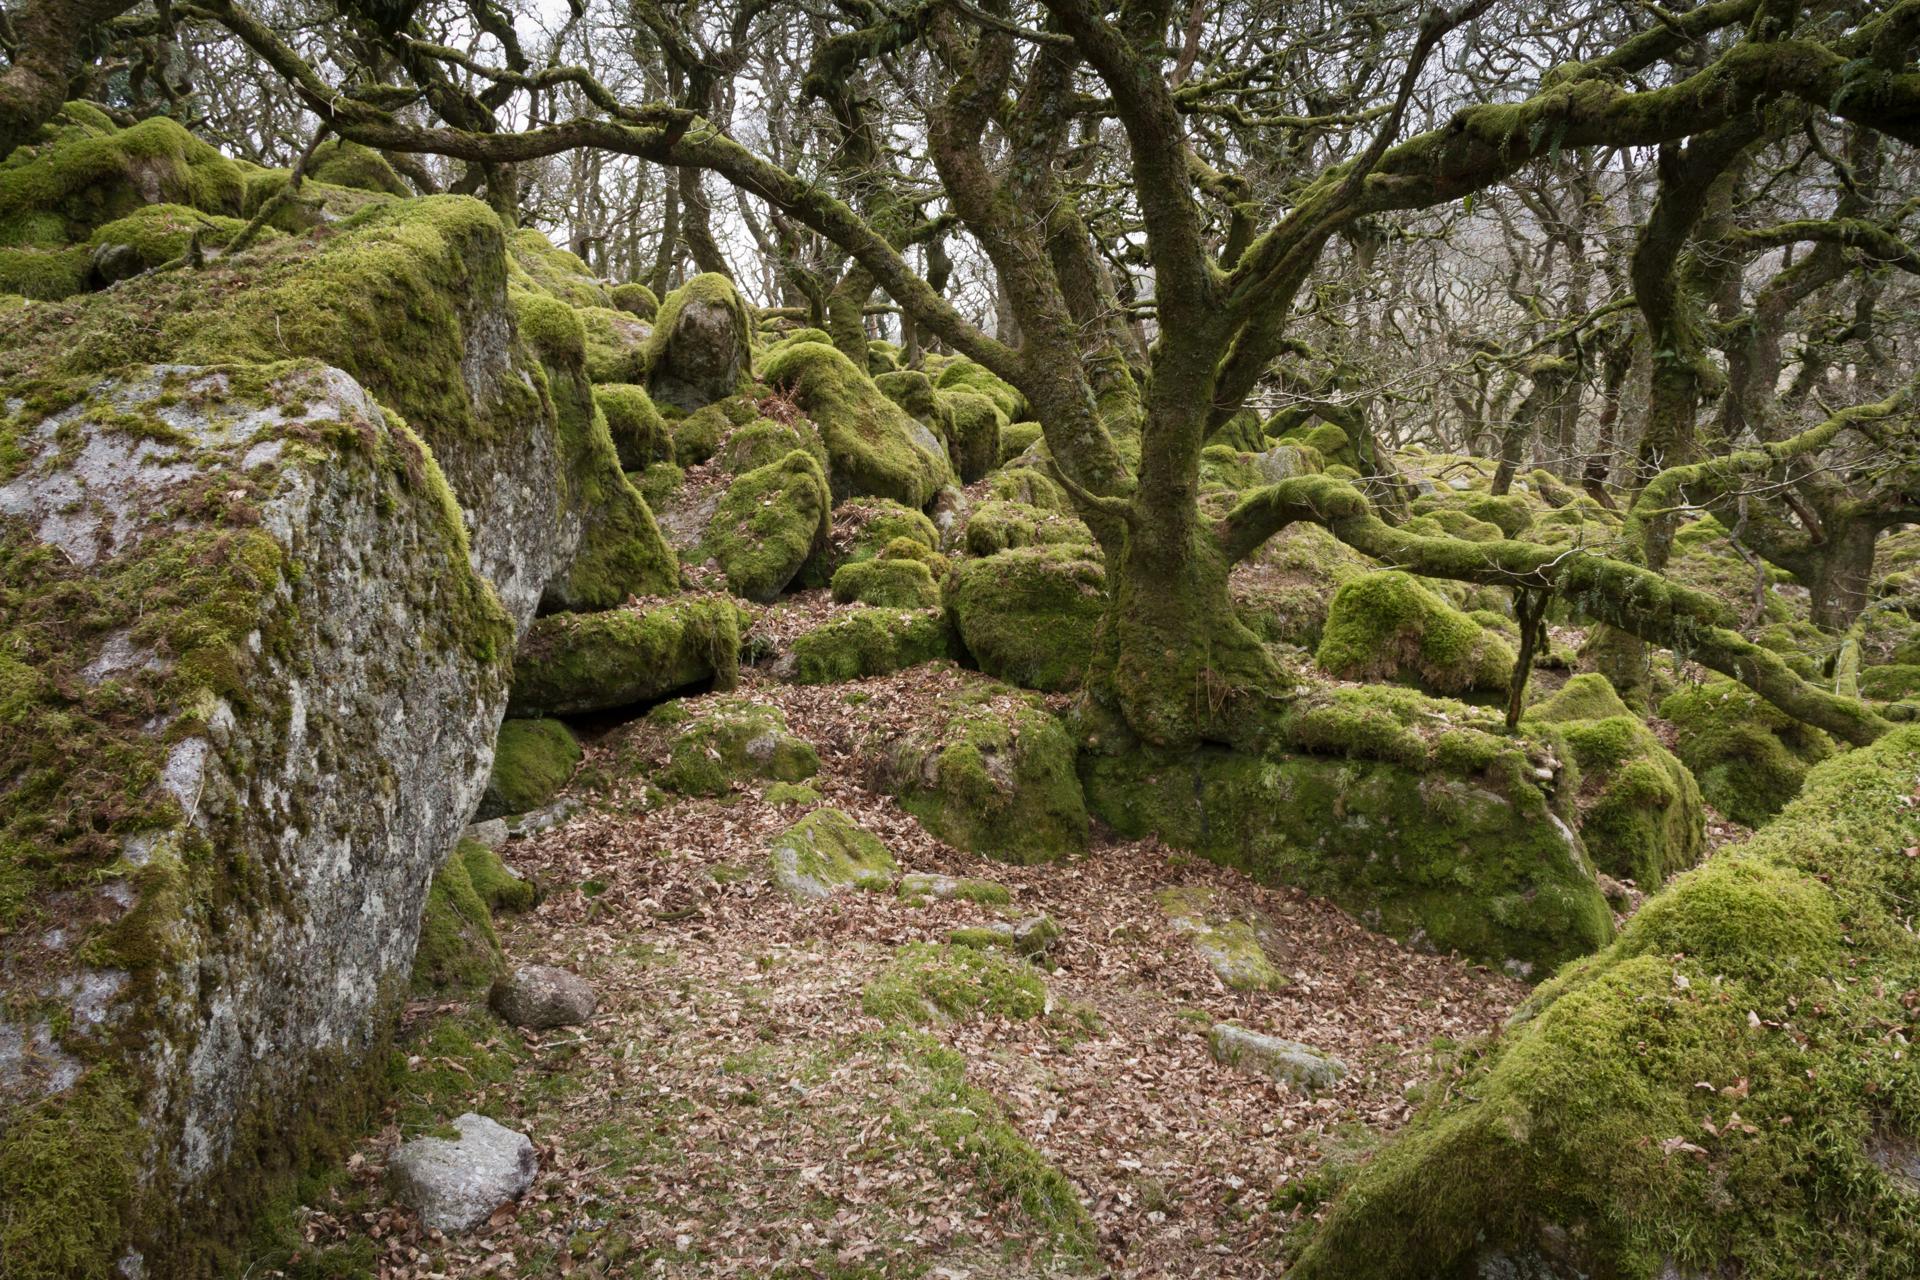 CC, By Miles Wolstenholme https://commons.wikimedia.org/wiki/File:Black-a-Tor_Copse_-_Dartmoor_-_South_Devon,_England.jpg